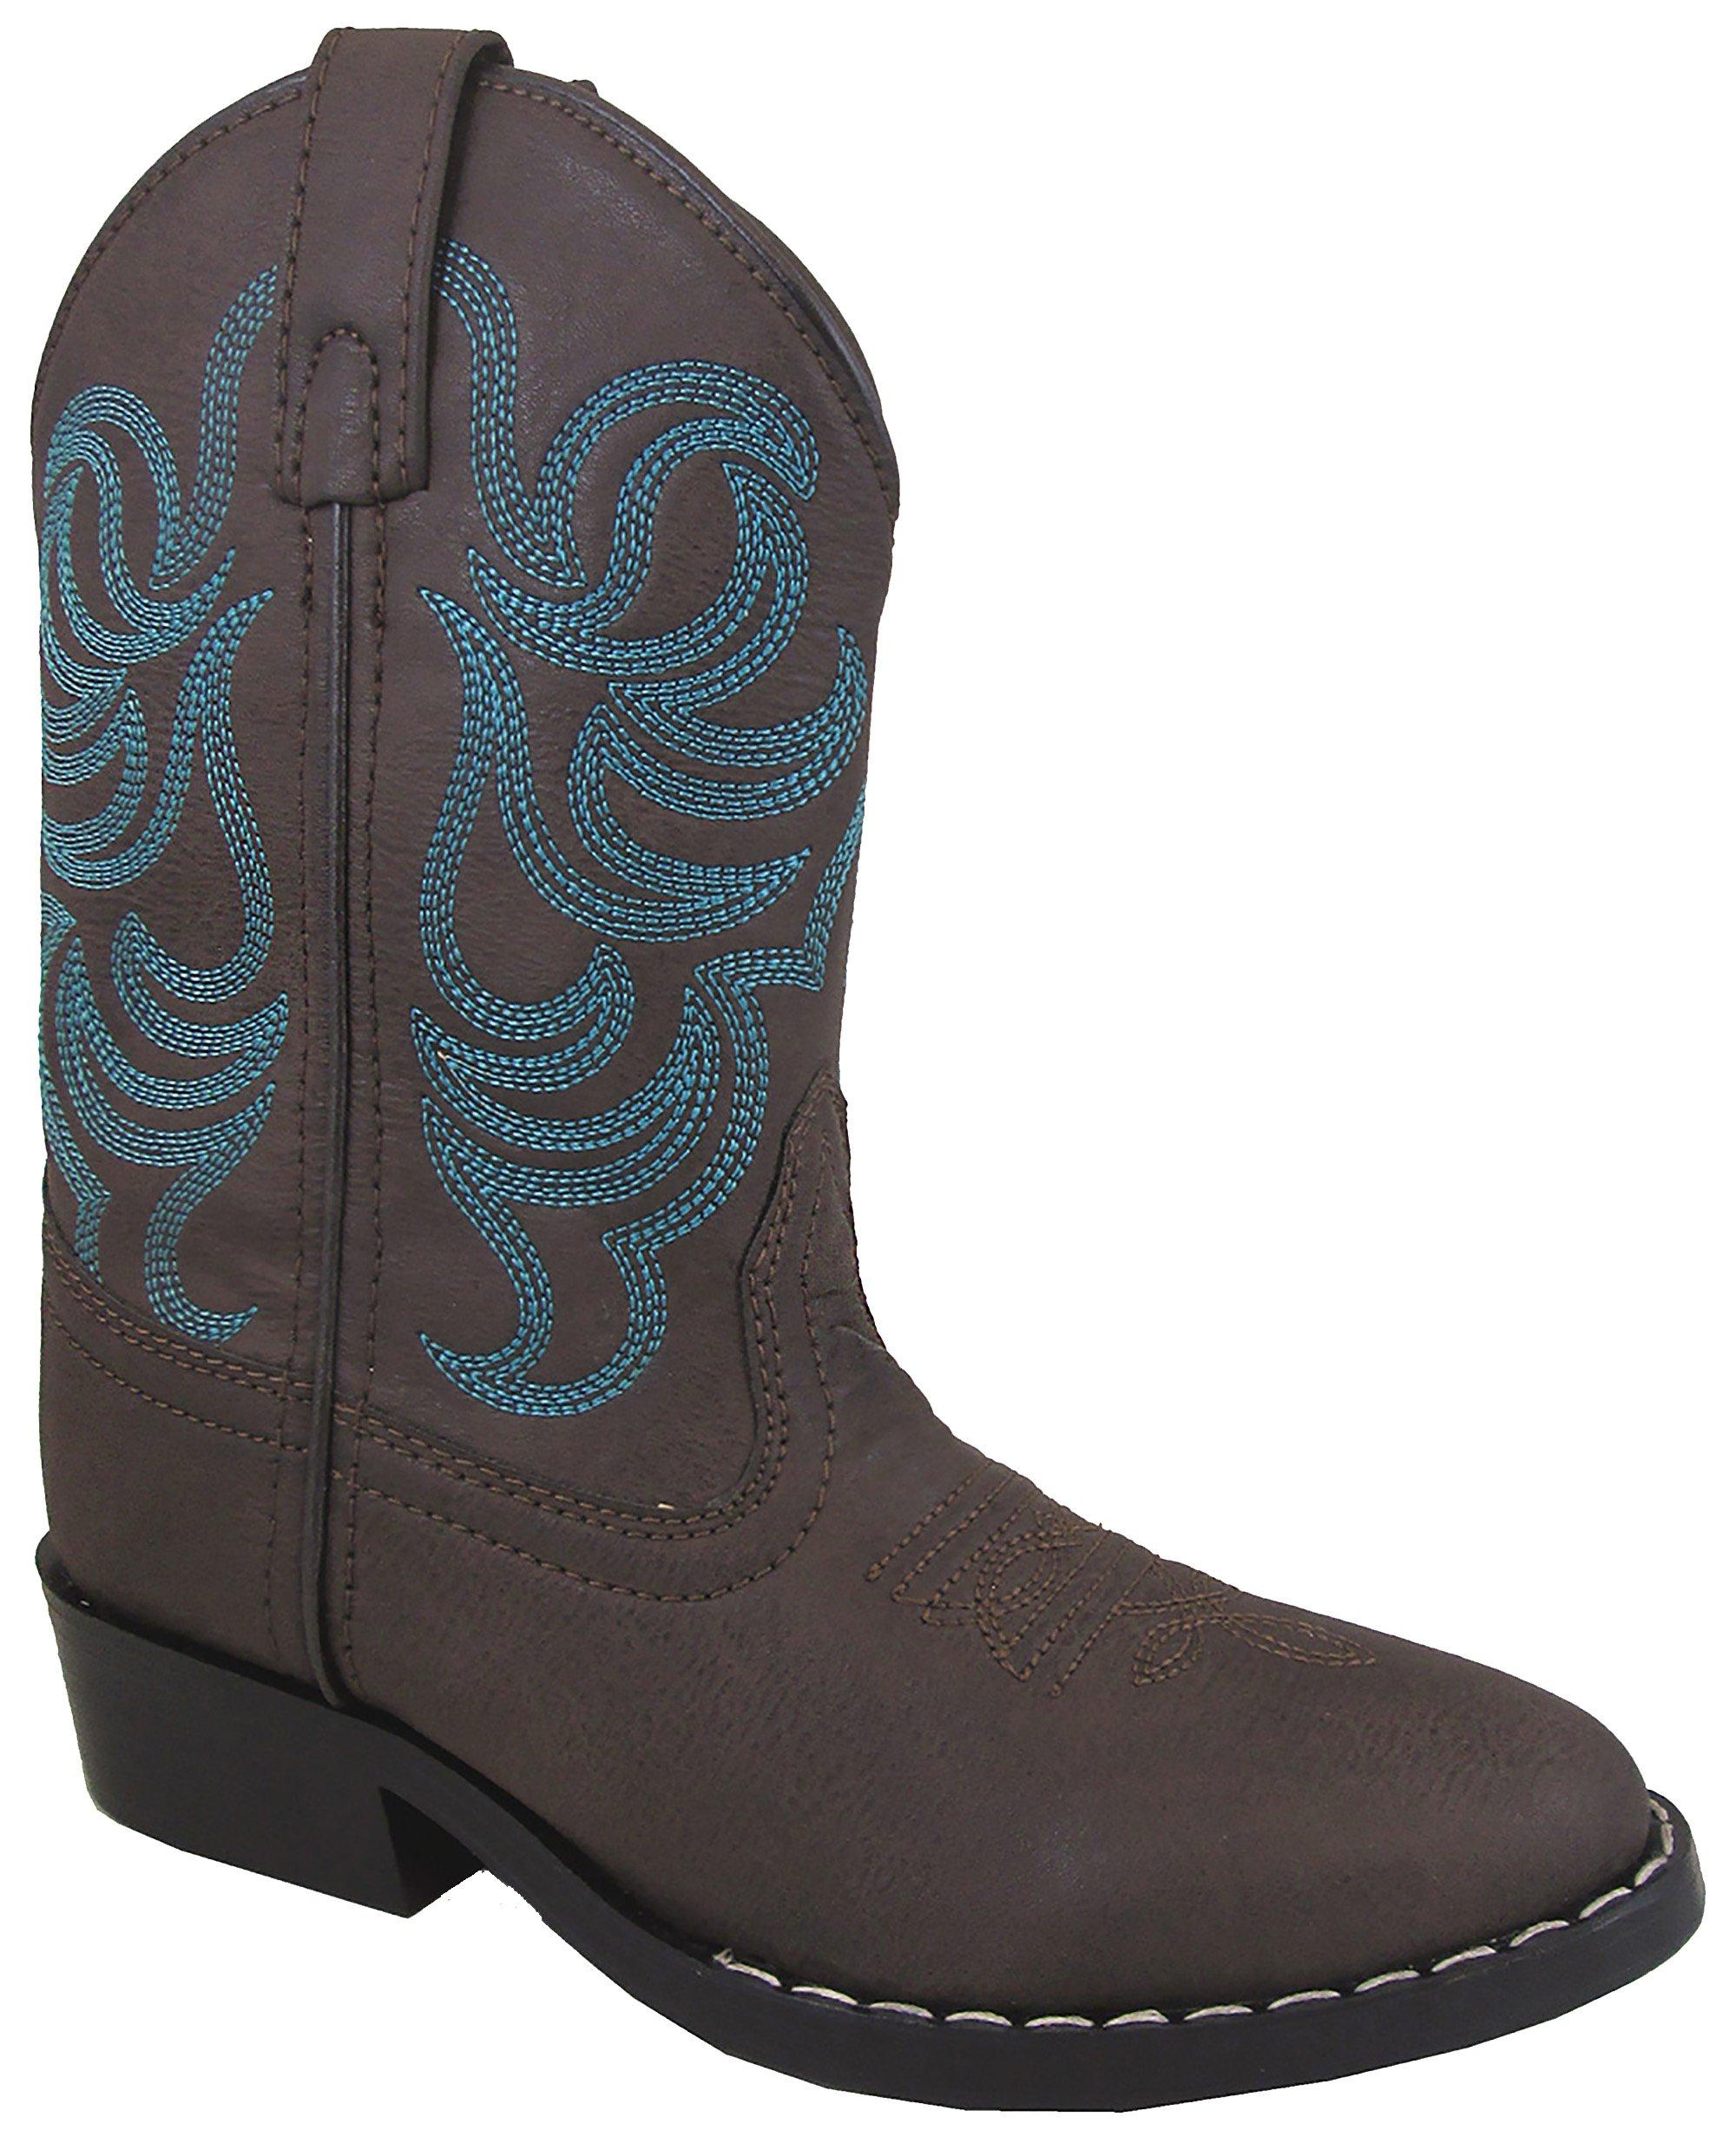 Smoky Mountain Boys Brown Blue Stitch Monterey Western Cowboy Boots